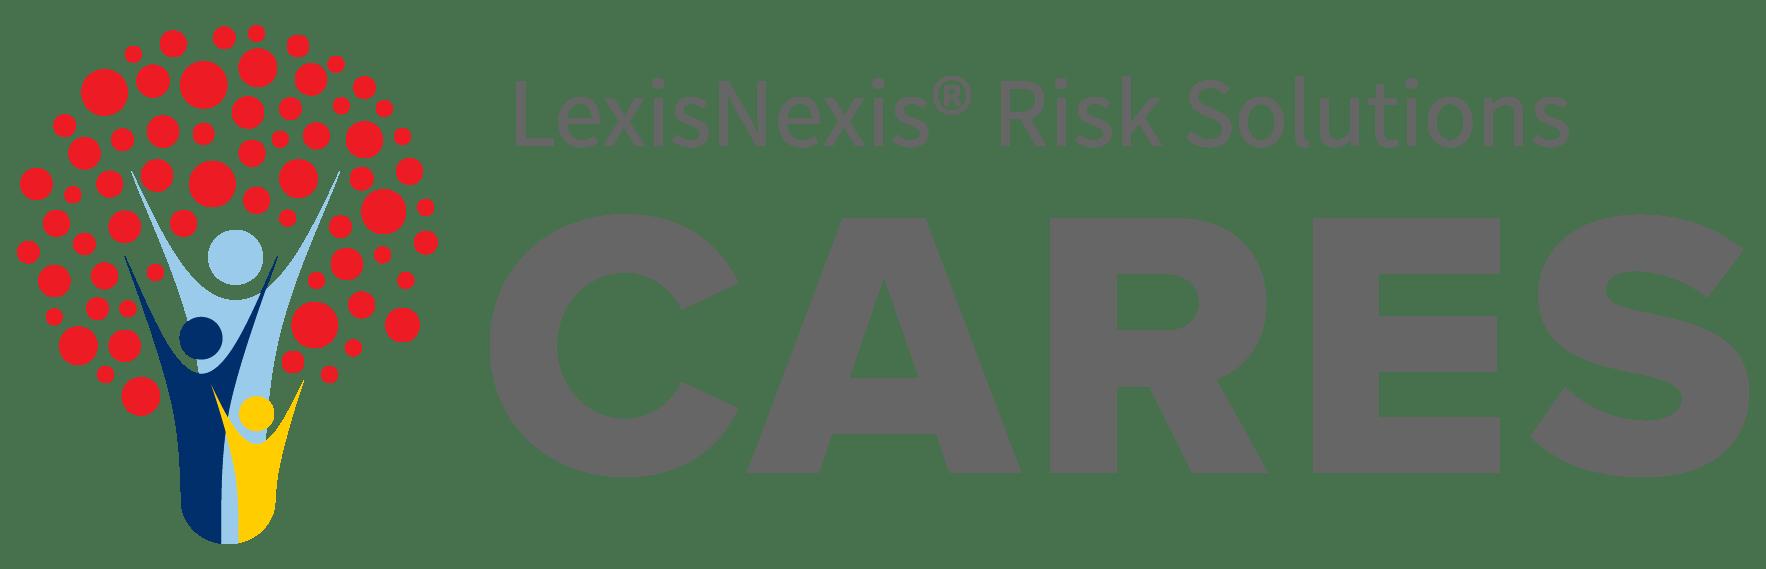 LexisNexis Cares, part of recares